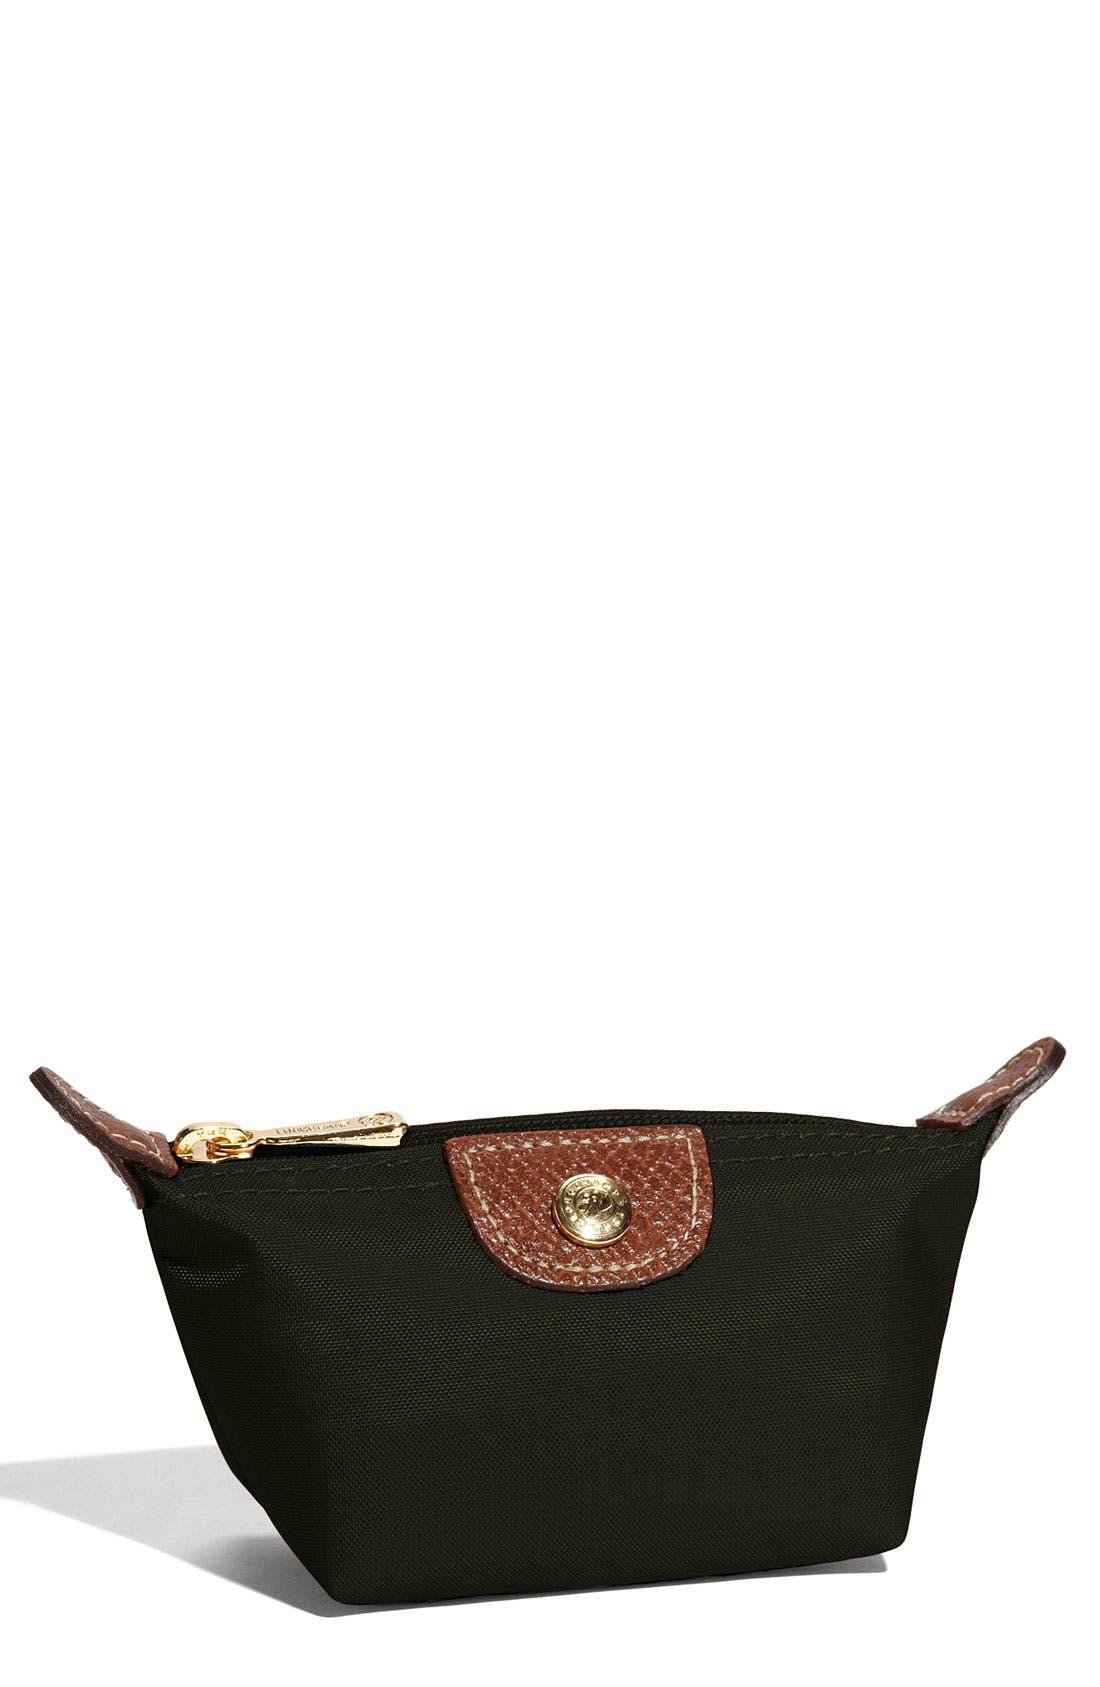 Alternate Image 1 Selected - Longchamp 'Le Pliage' Coin Purse